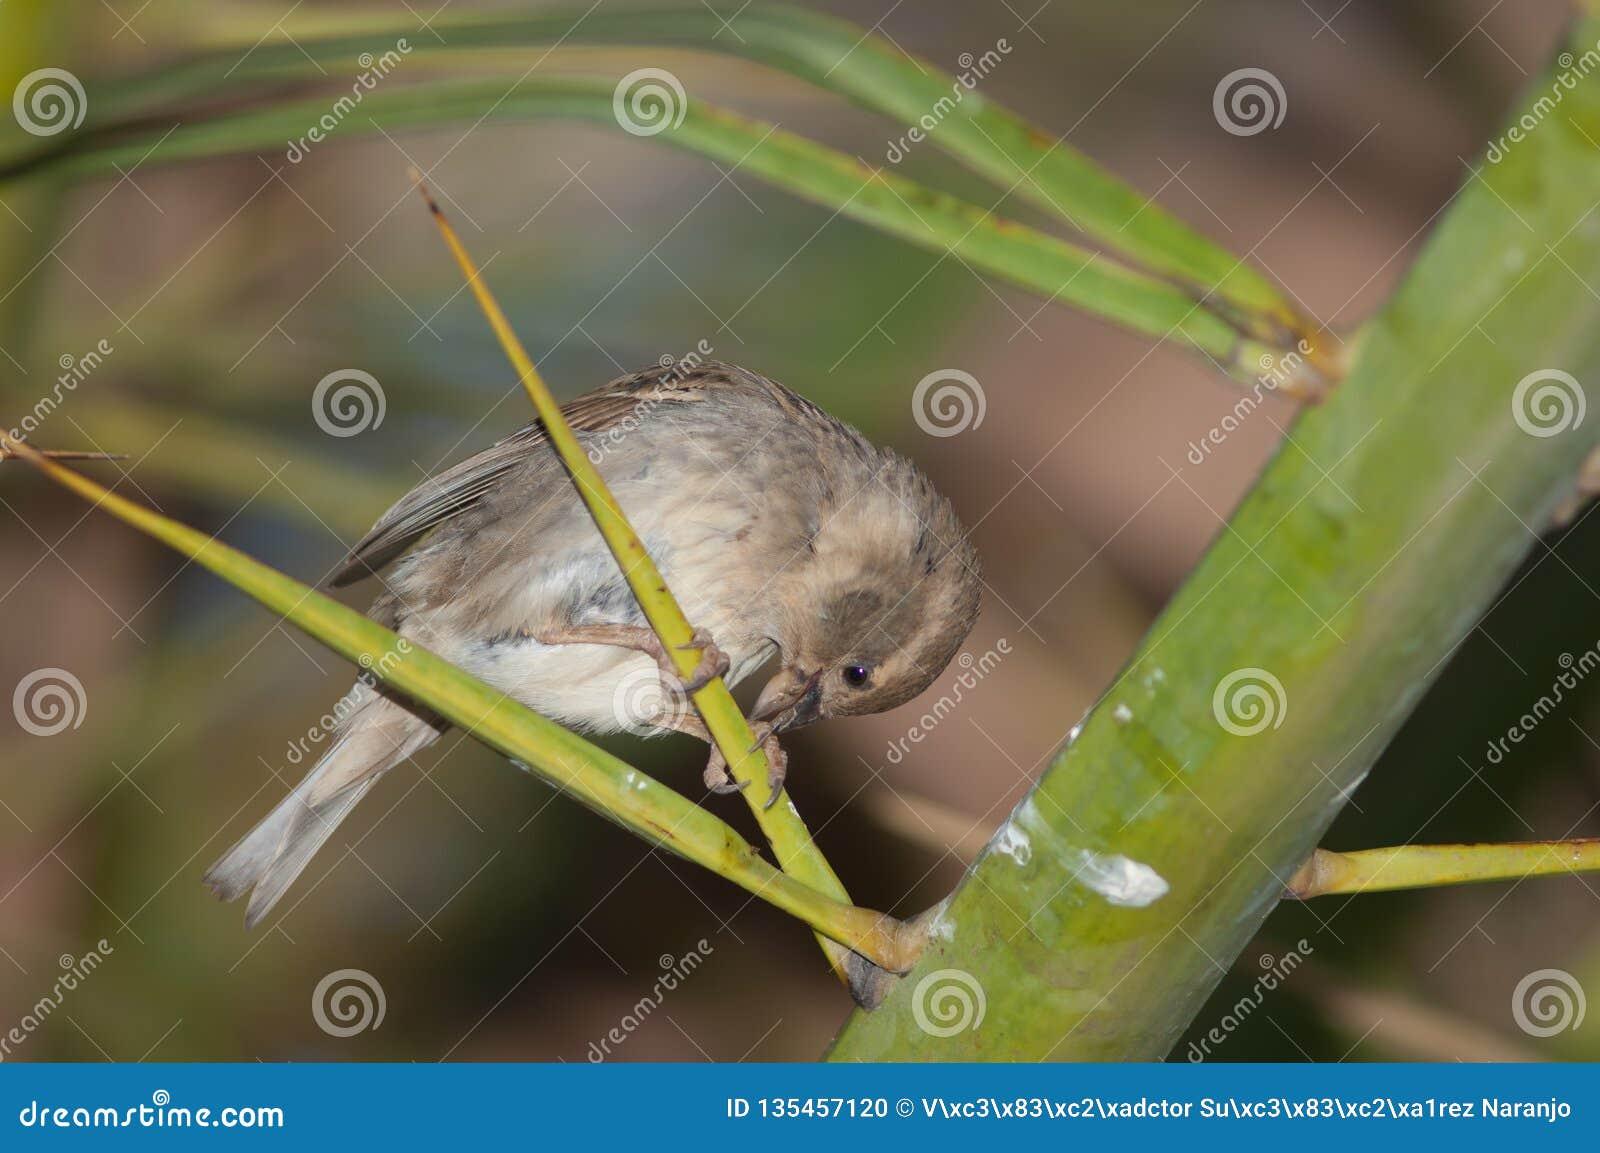 Spanish sparrow Passer hispaniolensis.